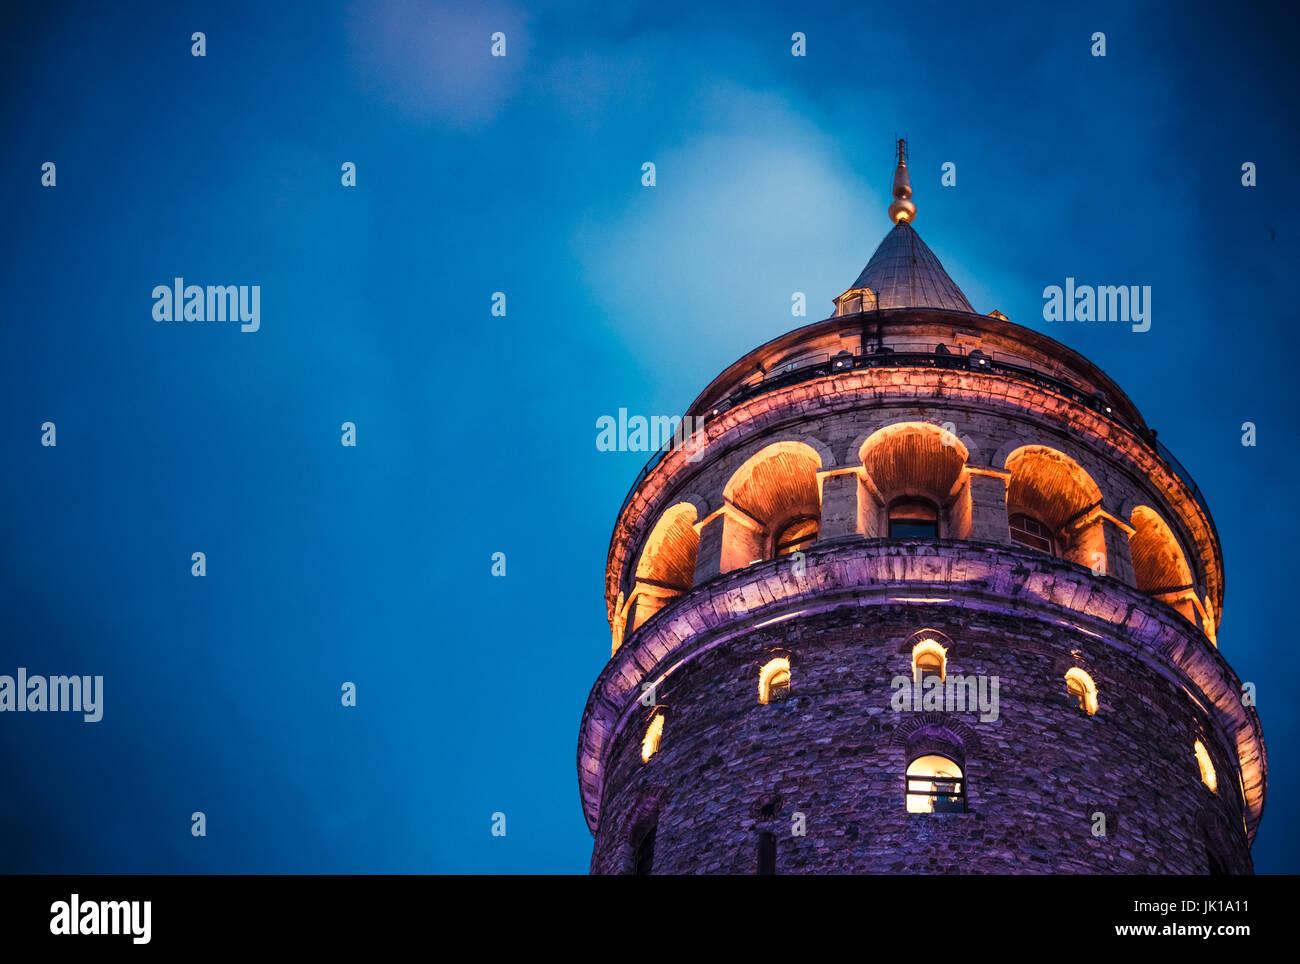 Notte Vista sulla Torre di Galata(turco: Galata Kulesi) (Galata Kulesih) Christea Turris è un medievale famoso Immagini Stock